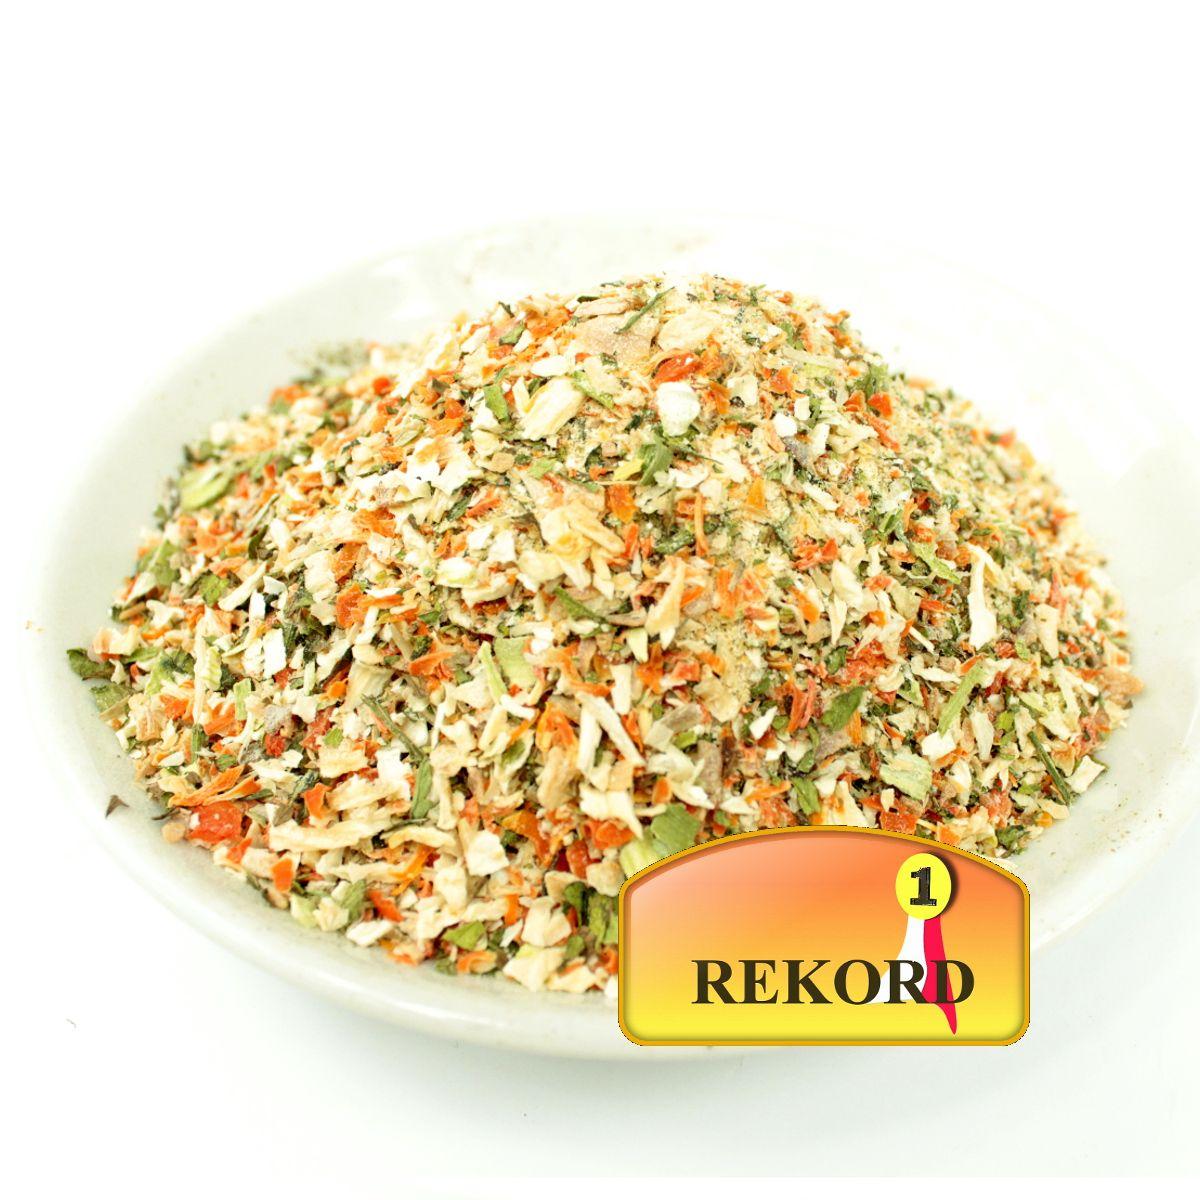 Dried Vegetables Mix - Parsnip,Carrot,Leek,Onion,Parsley